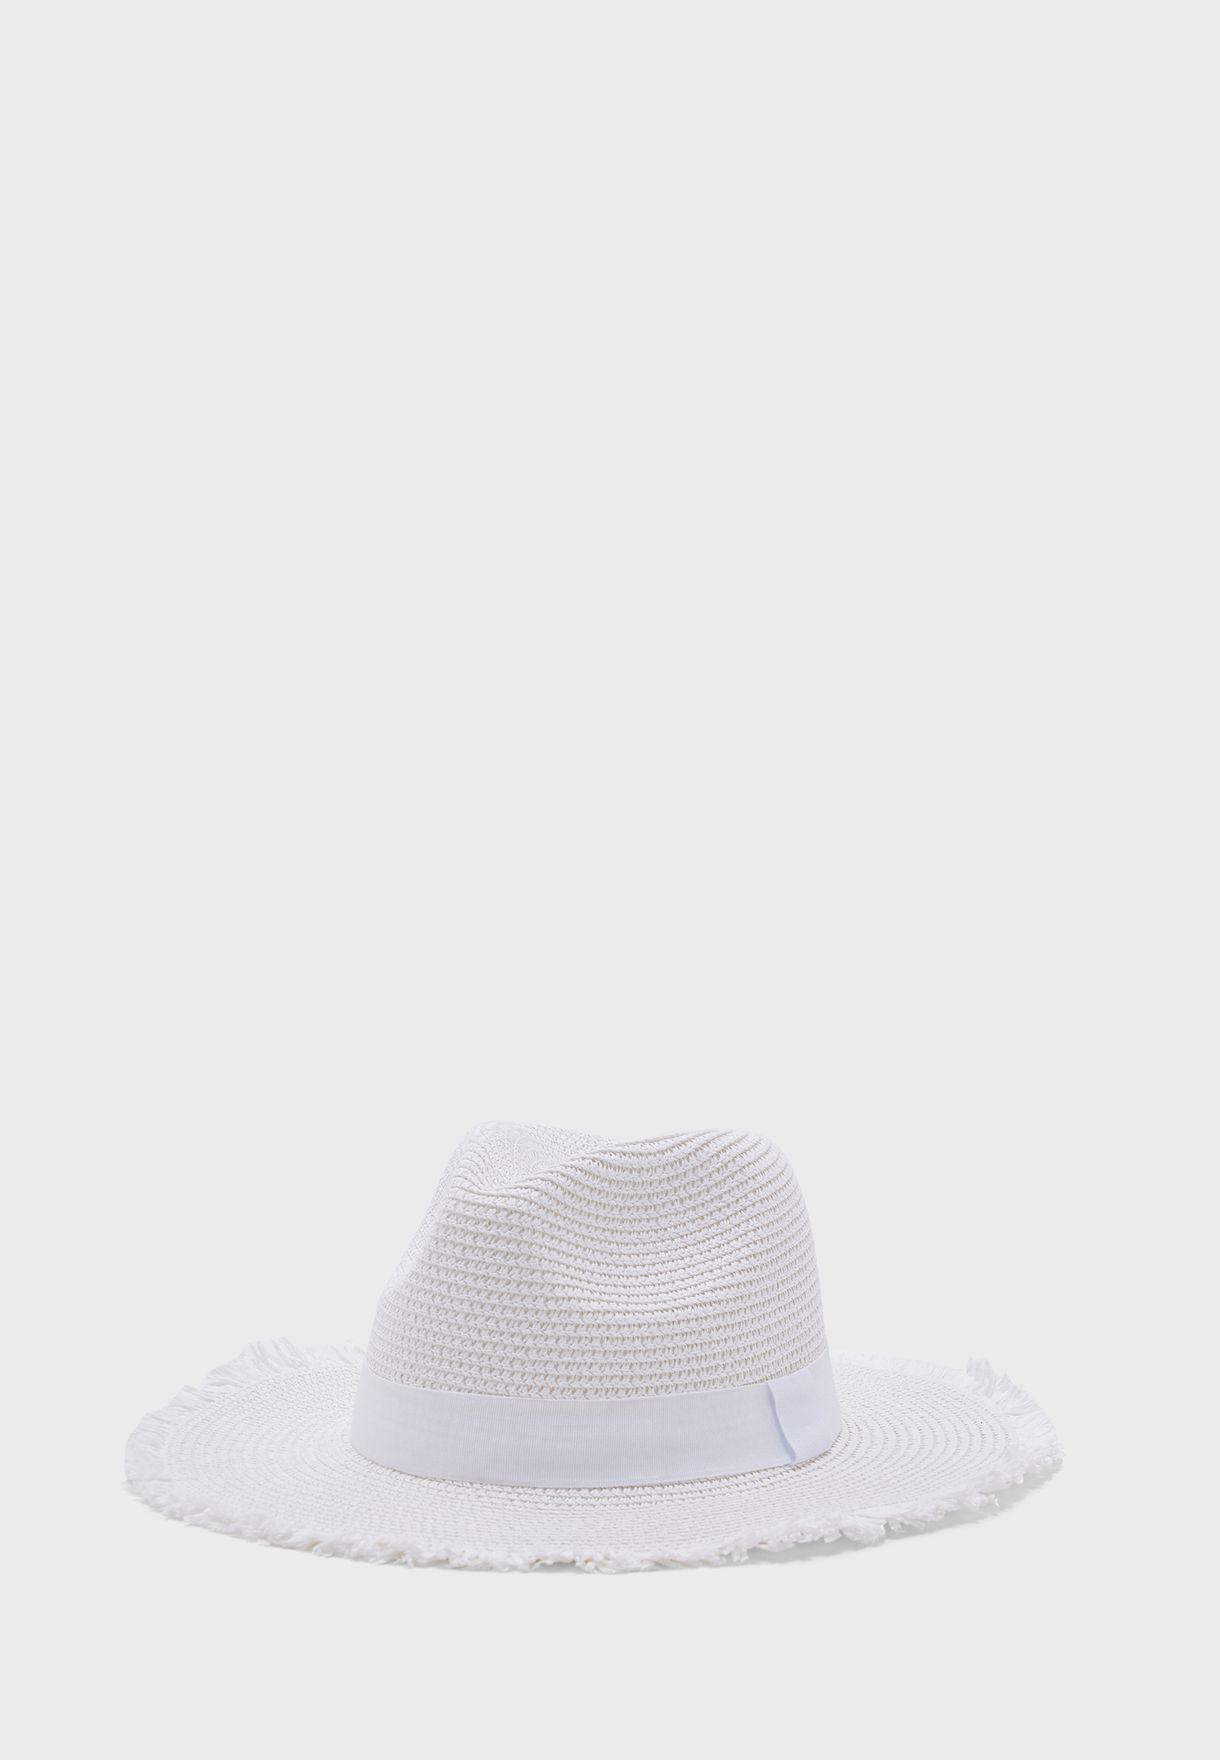 Frayed  Edge Straw Fedora Hat